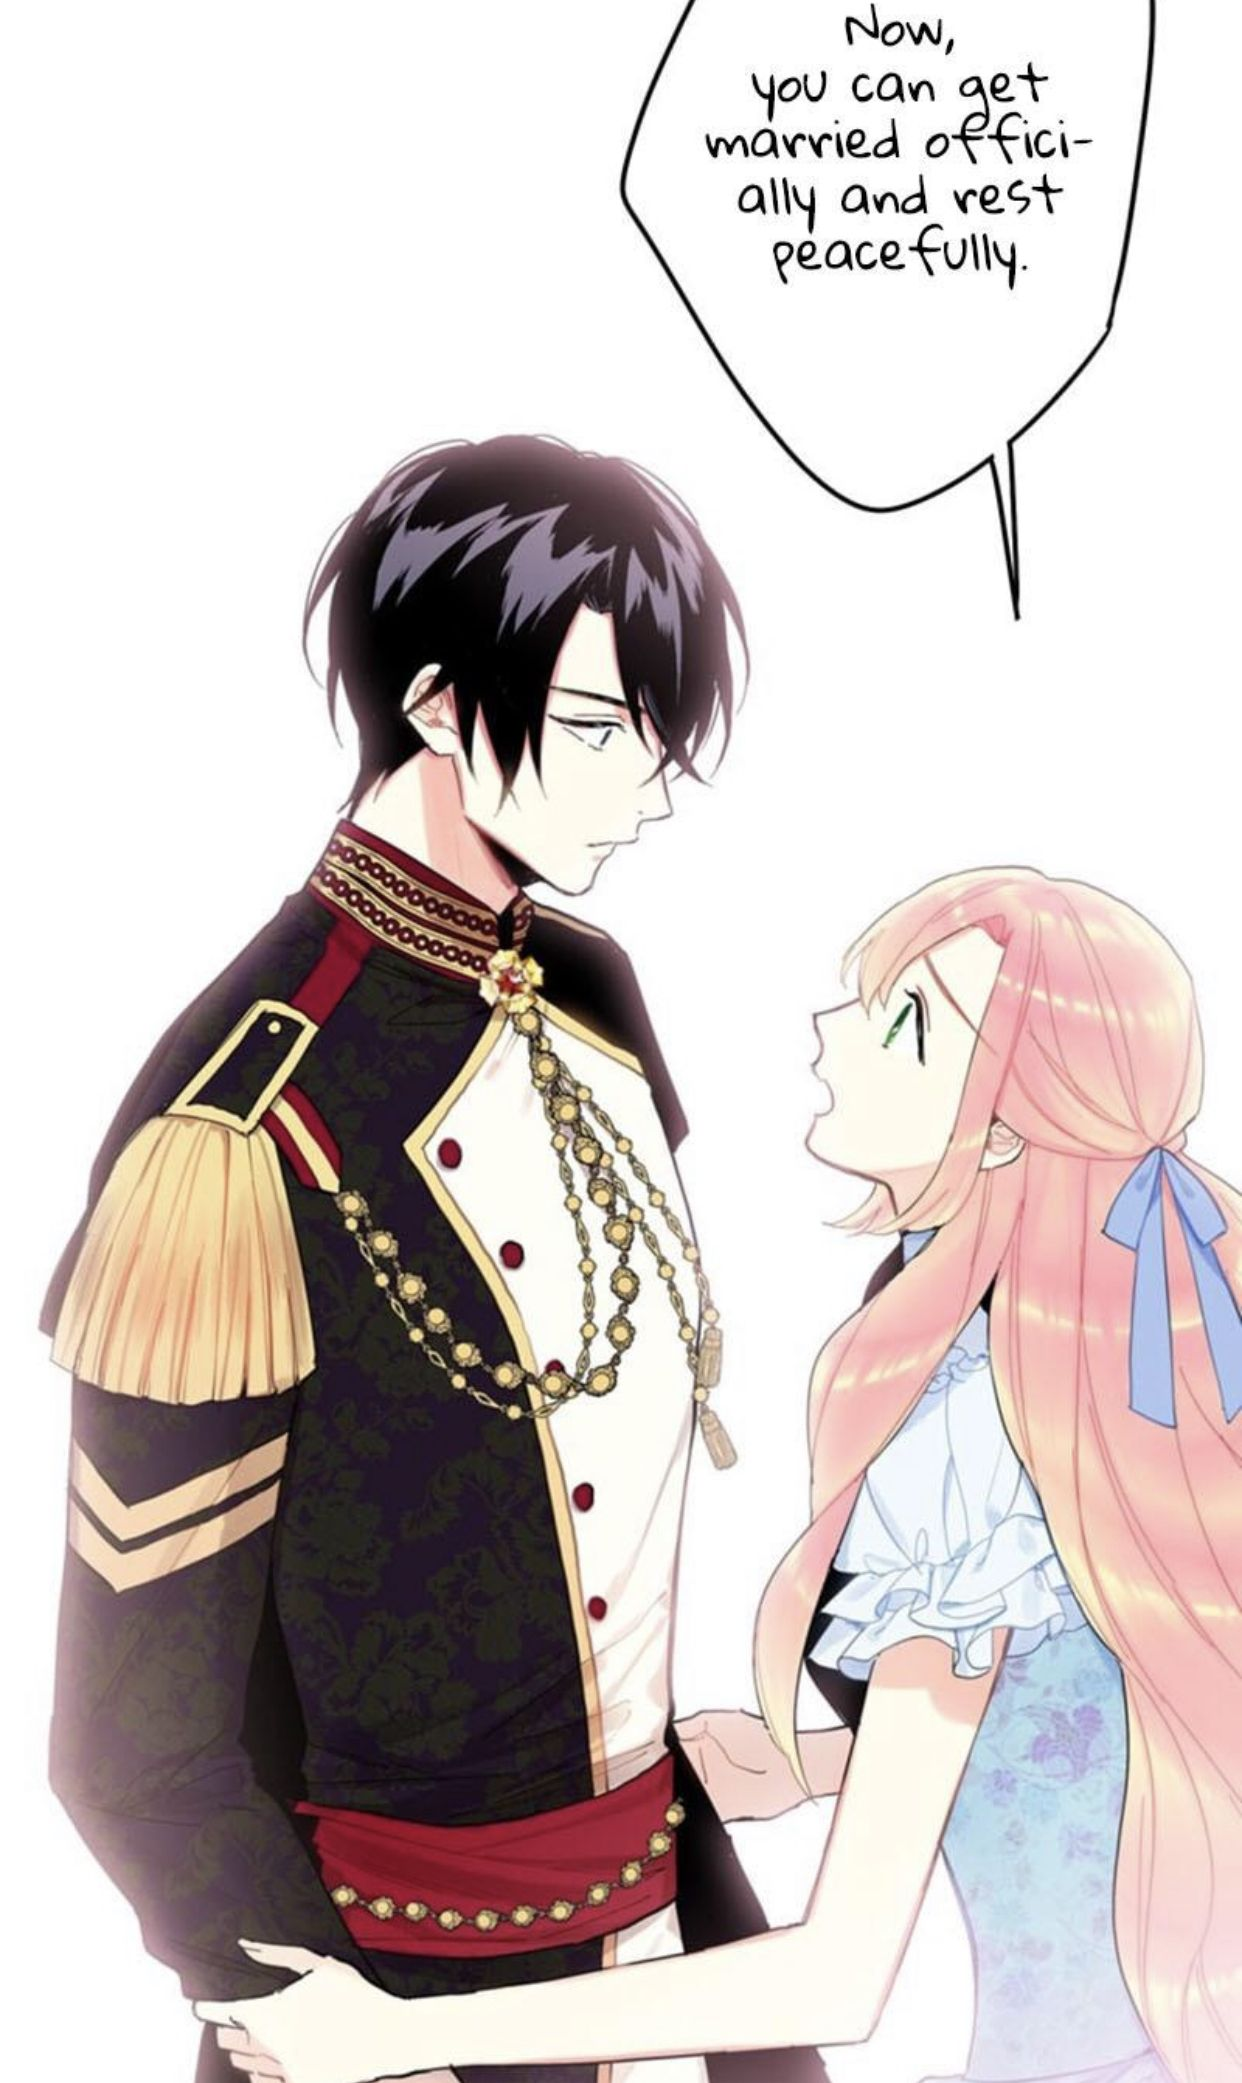 Chapter 24 Anime Love Couple Anime Princess Manhwa